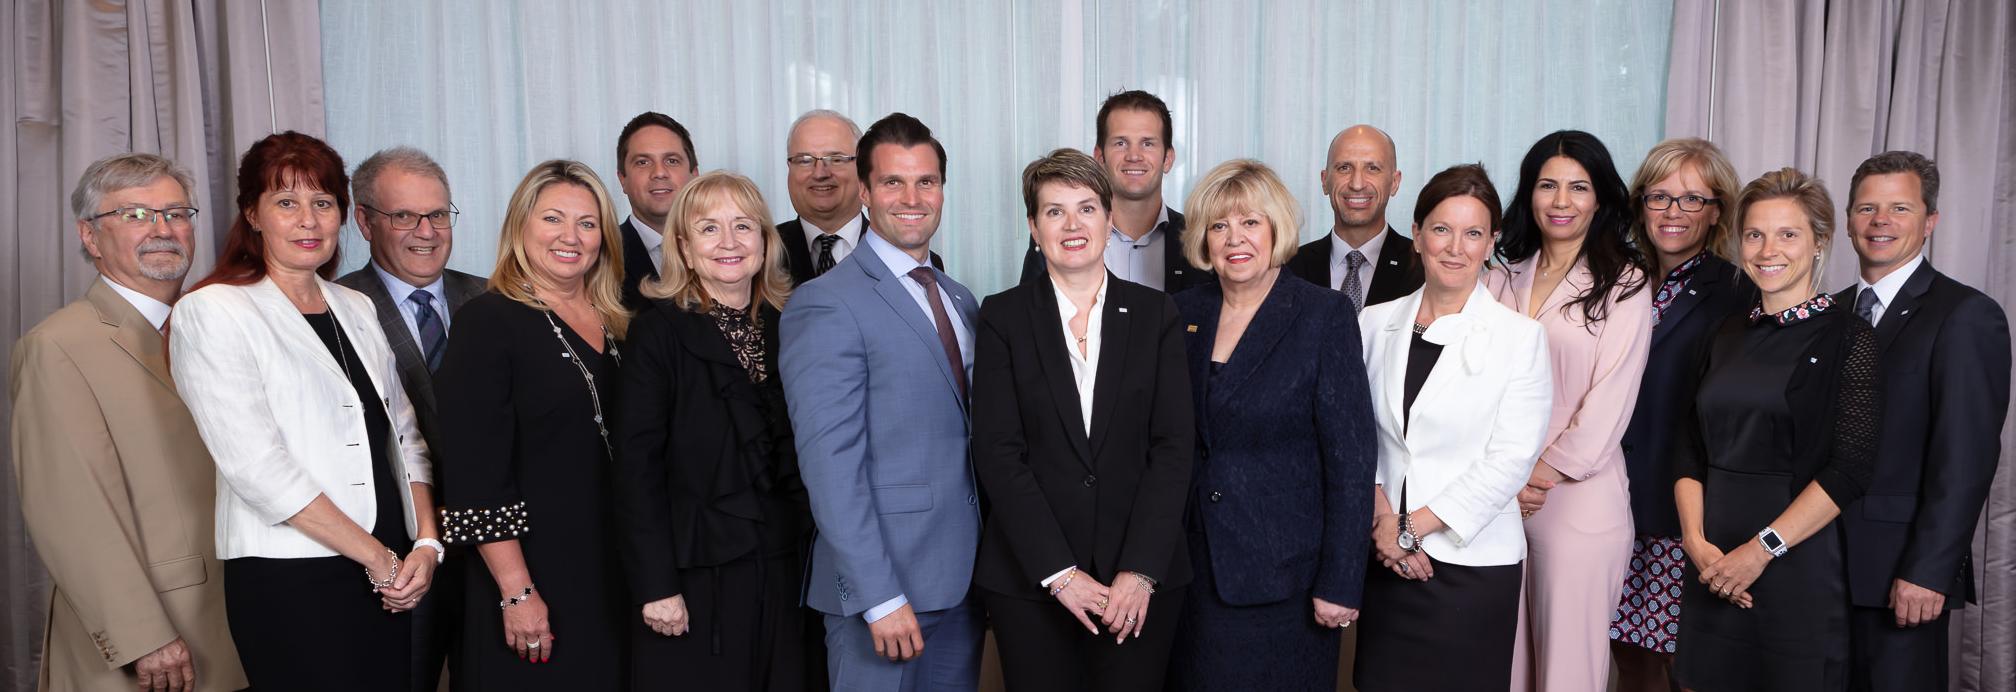 Conseil d'administration de l'IQPF 2019-2020